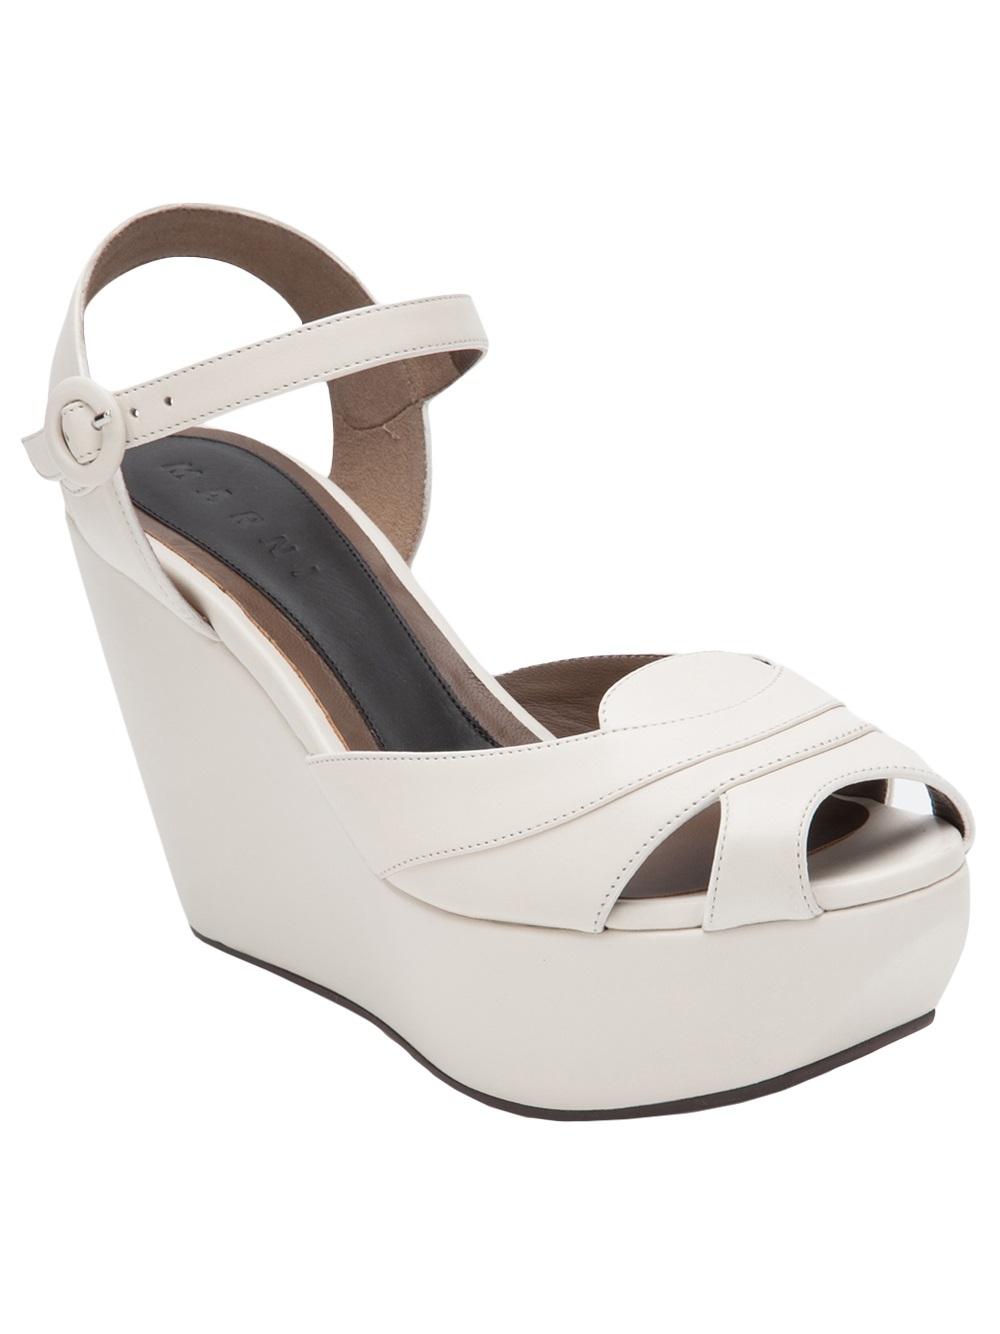 Marni Wedge platform sandals Enjoy Classic Wholesale Price Sale Explore pxS3jKd